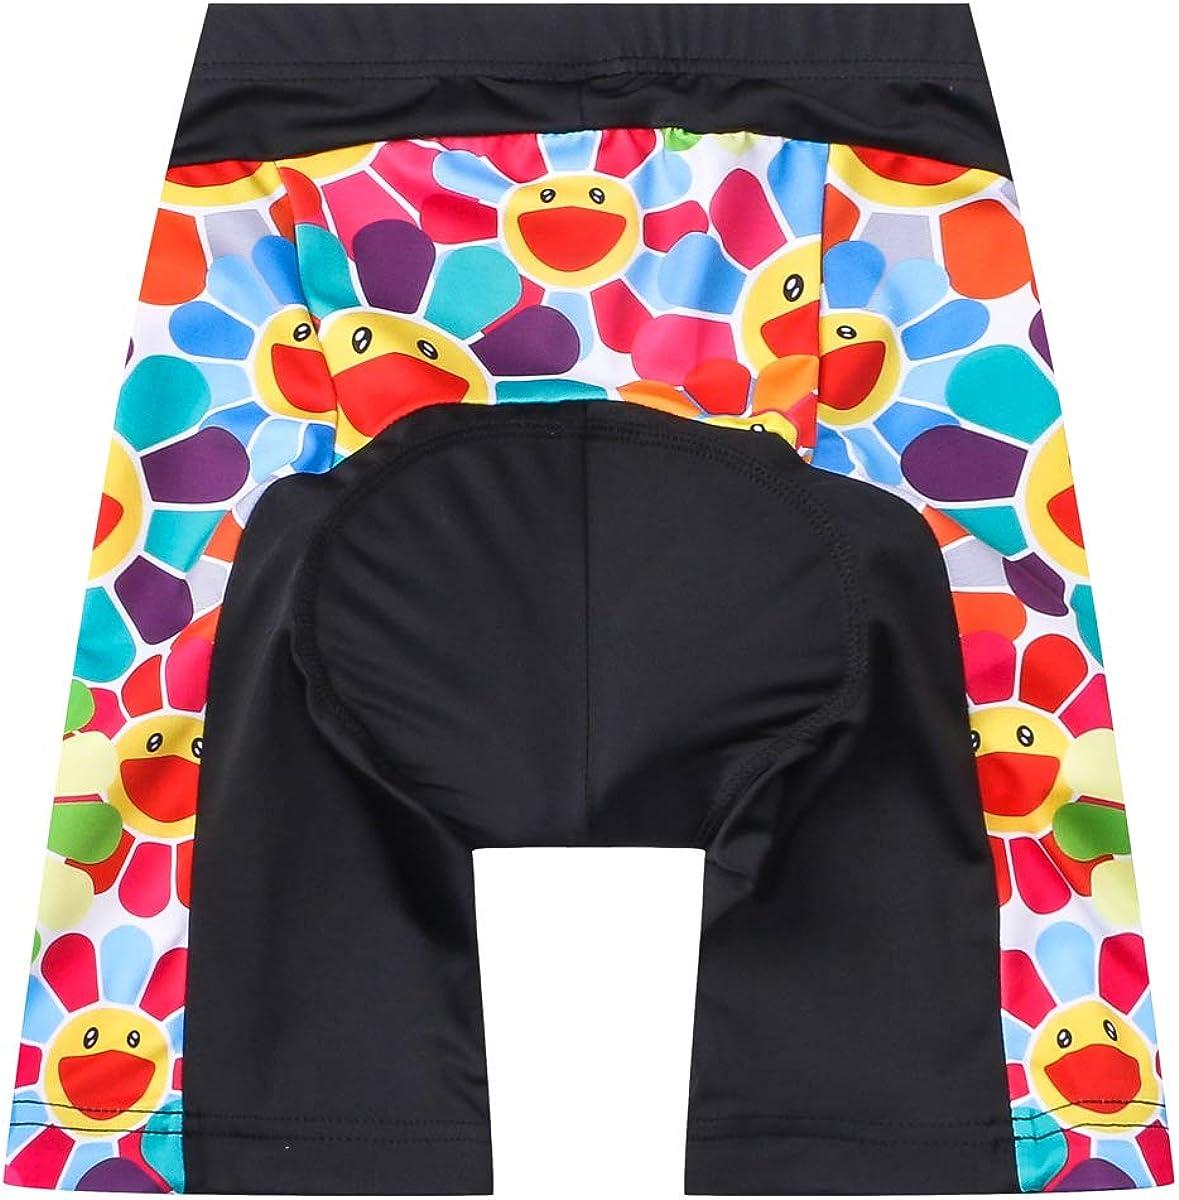 JPOJPO Cycling Bike Shorts Children Bicycle Riding Half Pants 4D Gel Padded Cycle Wear Tights